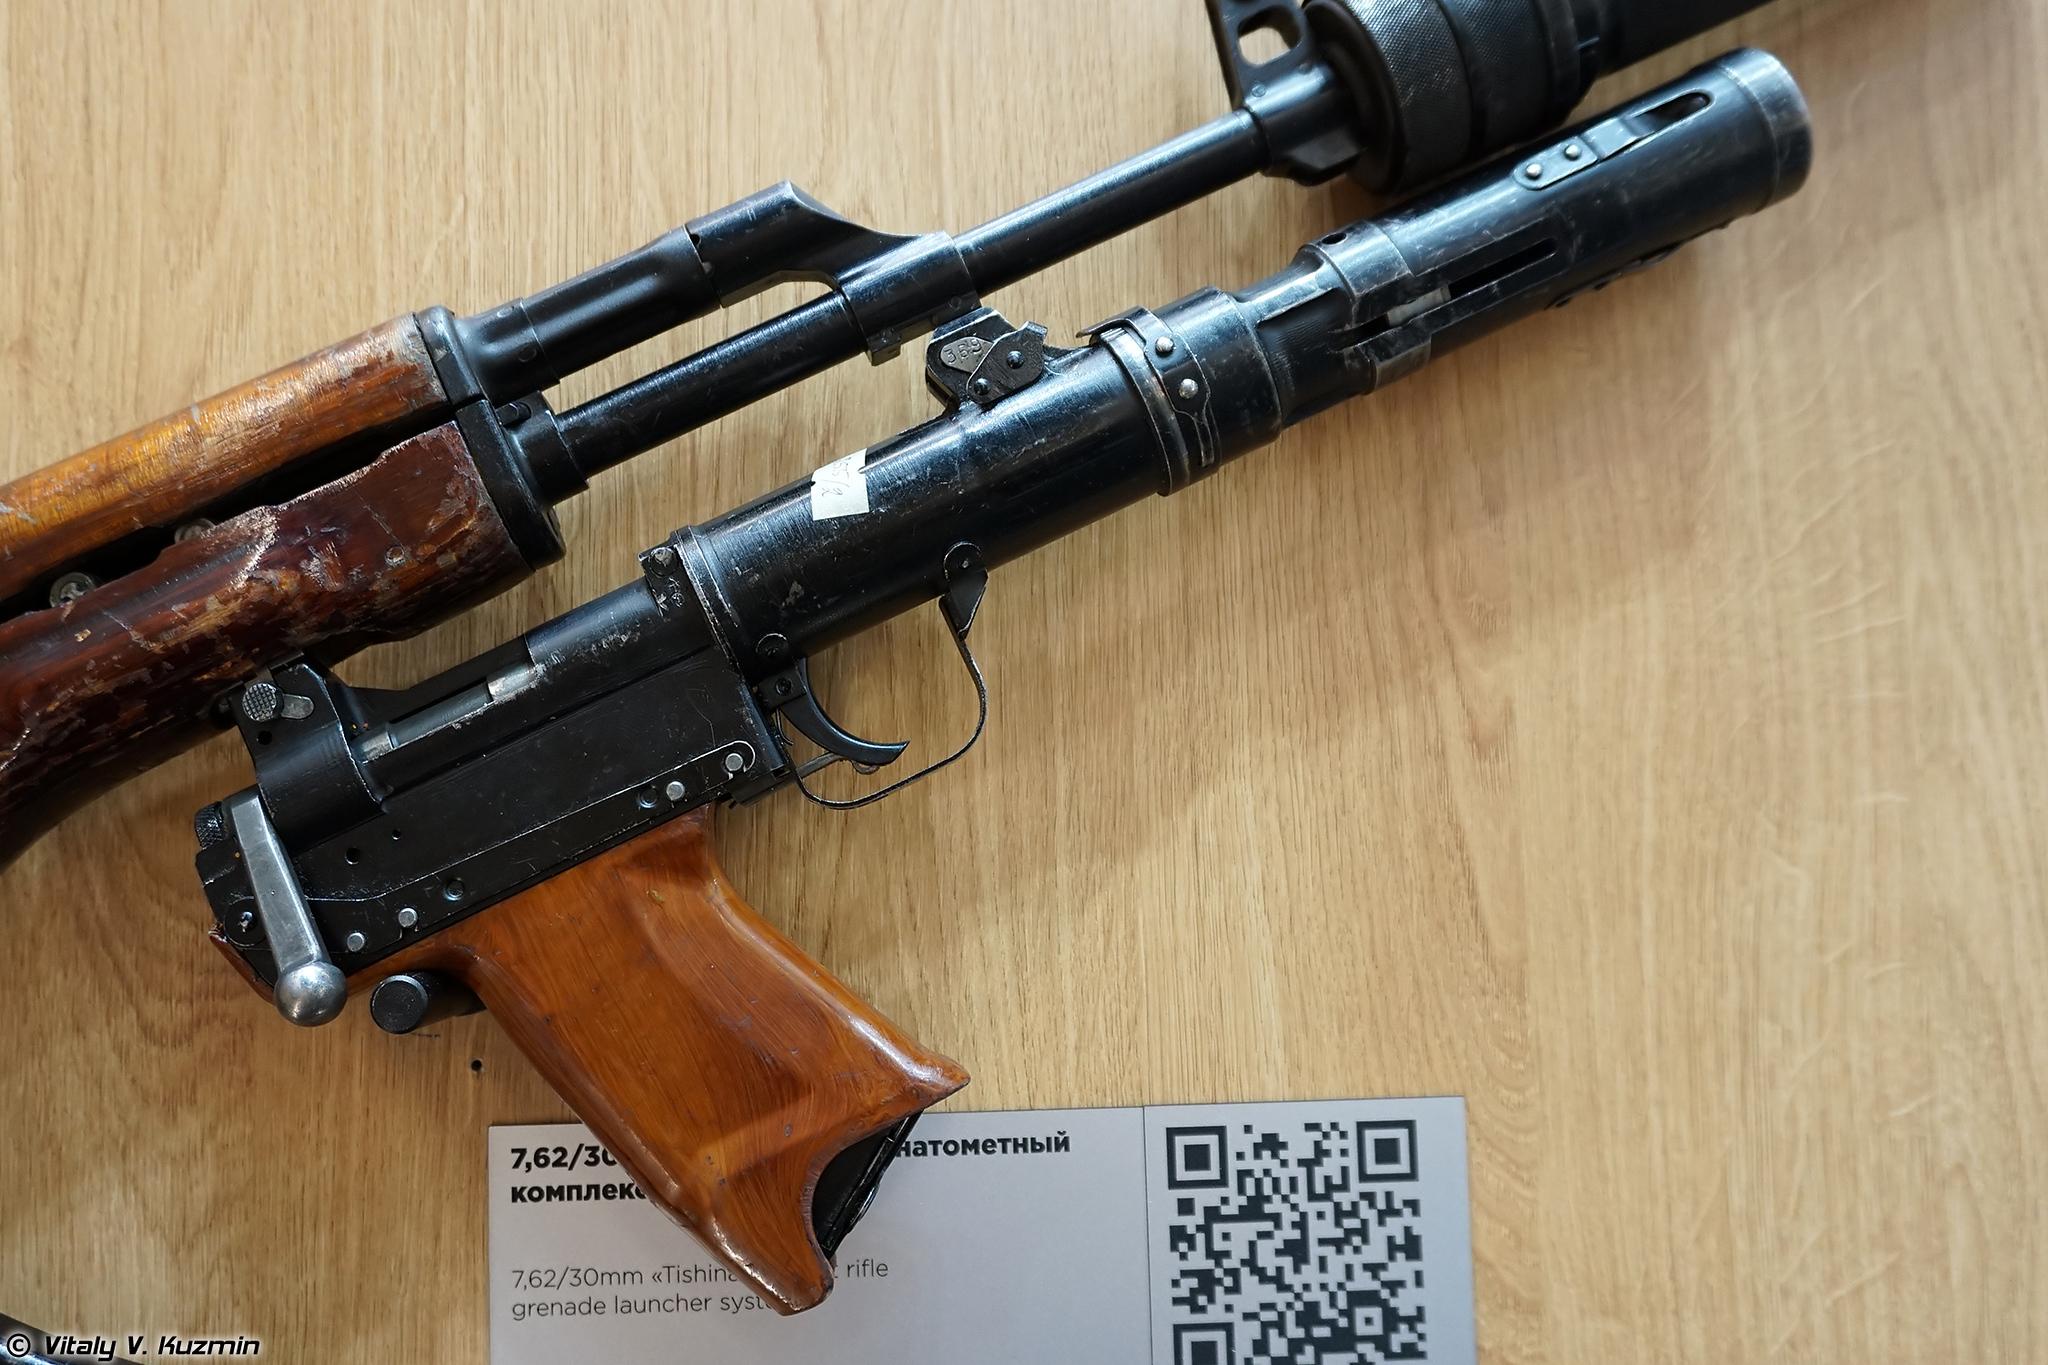 Russian Assault Rifles/Carbines/Machine Guns Thread: #2 - Page 10 Army-2020-Pavilions-044-X4